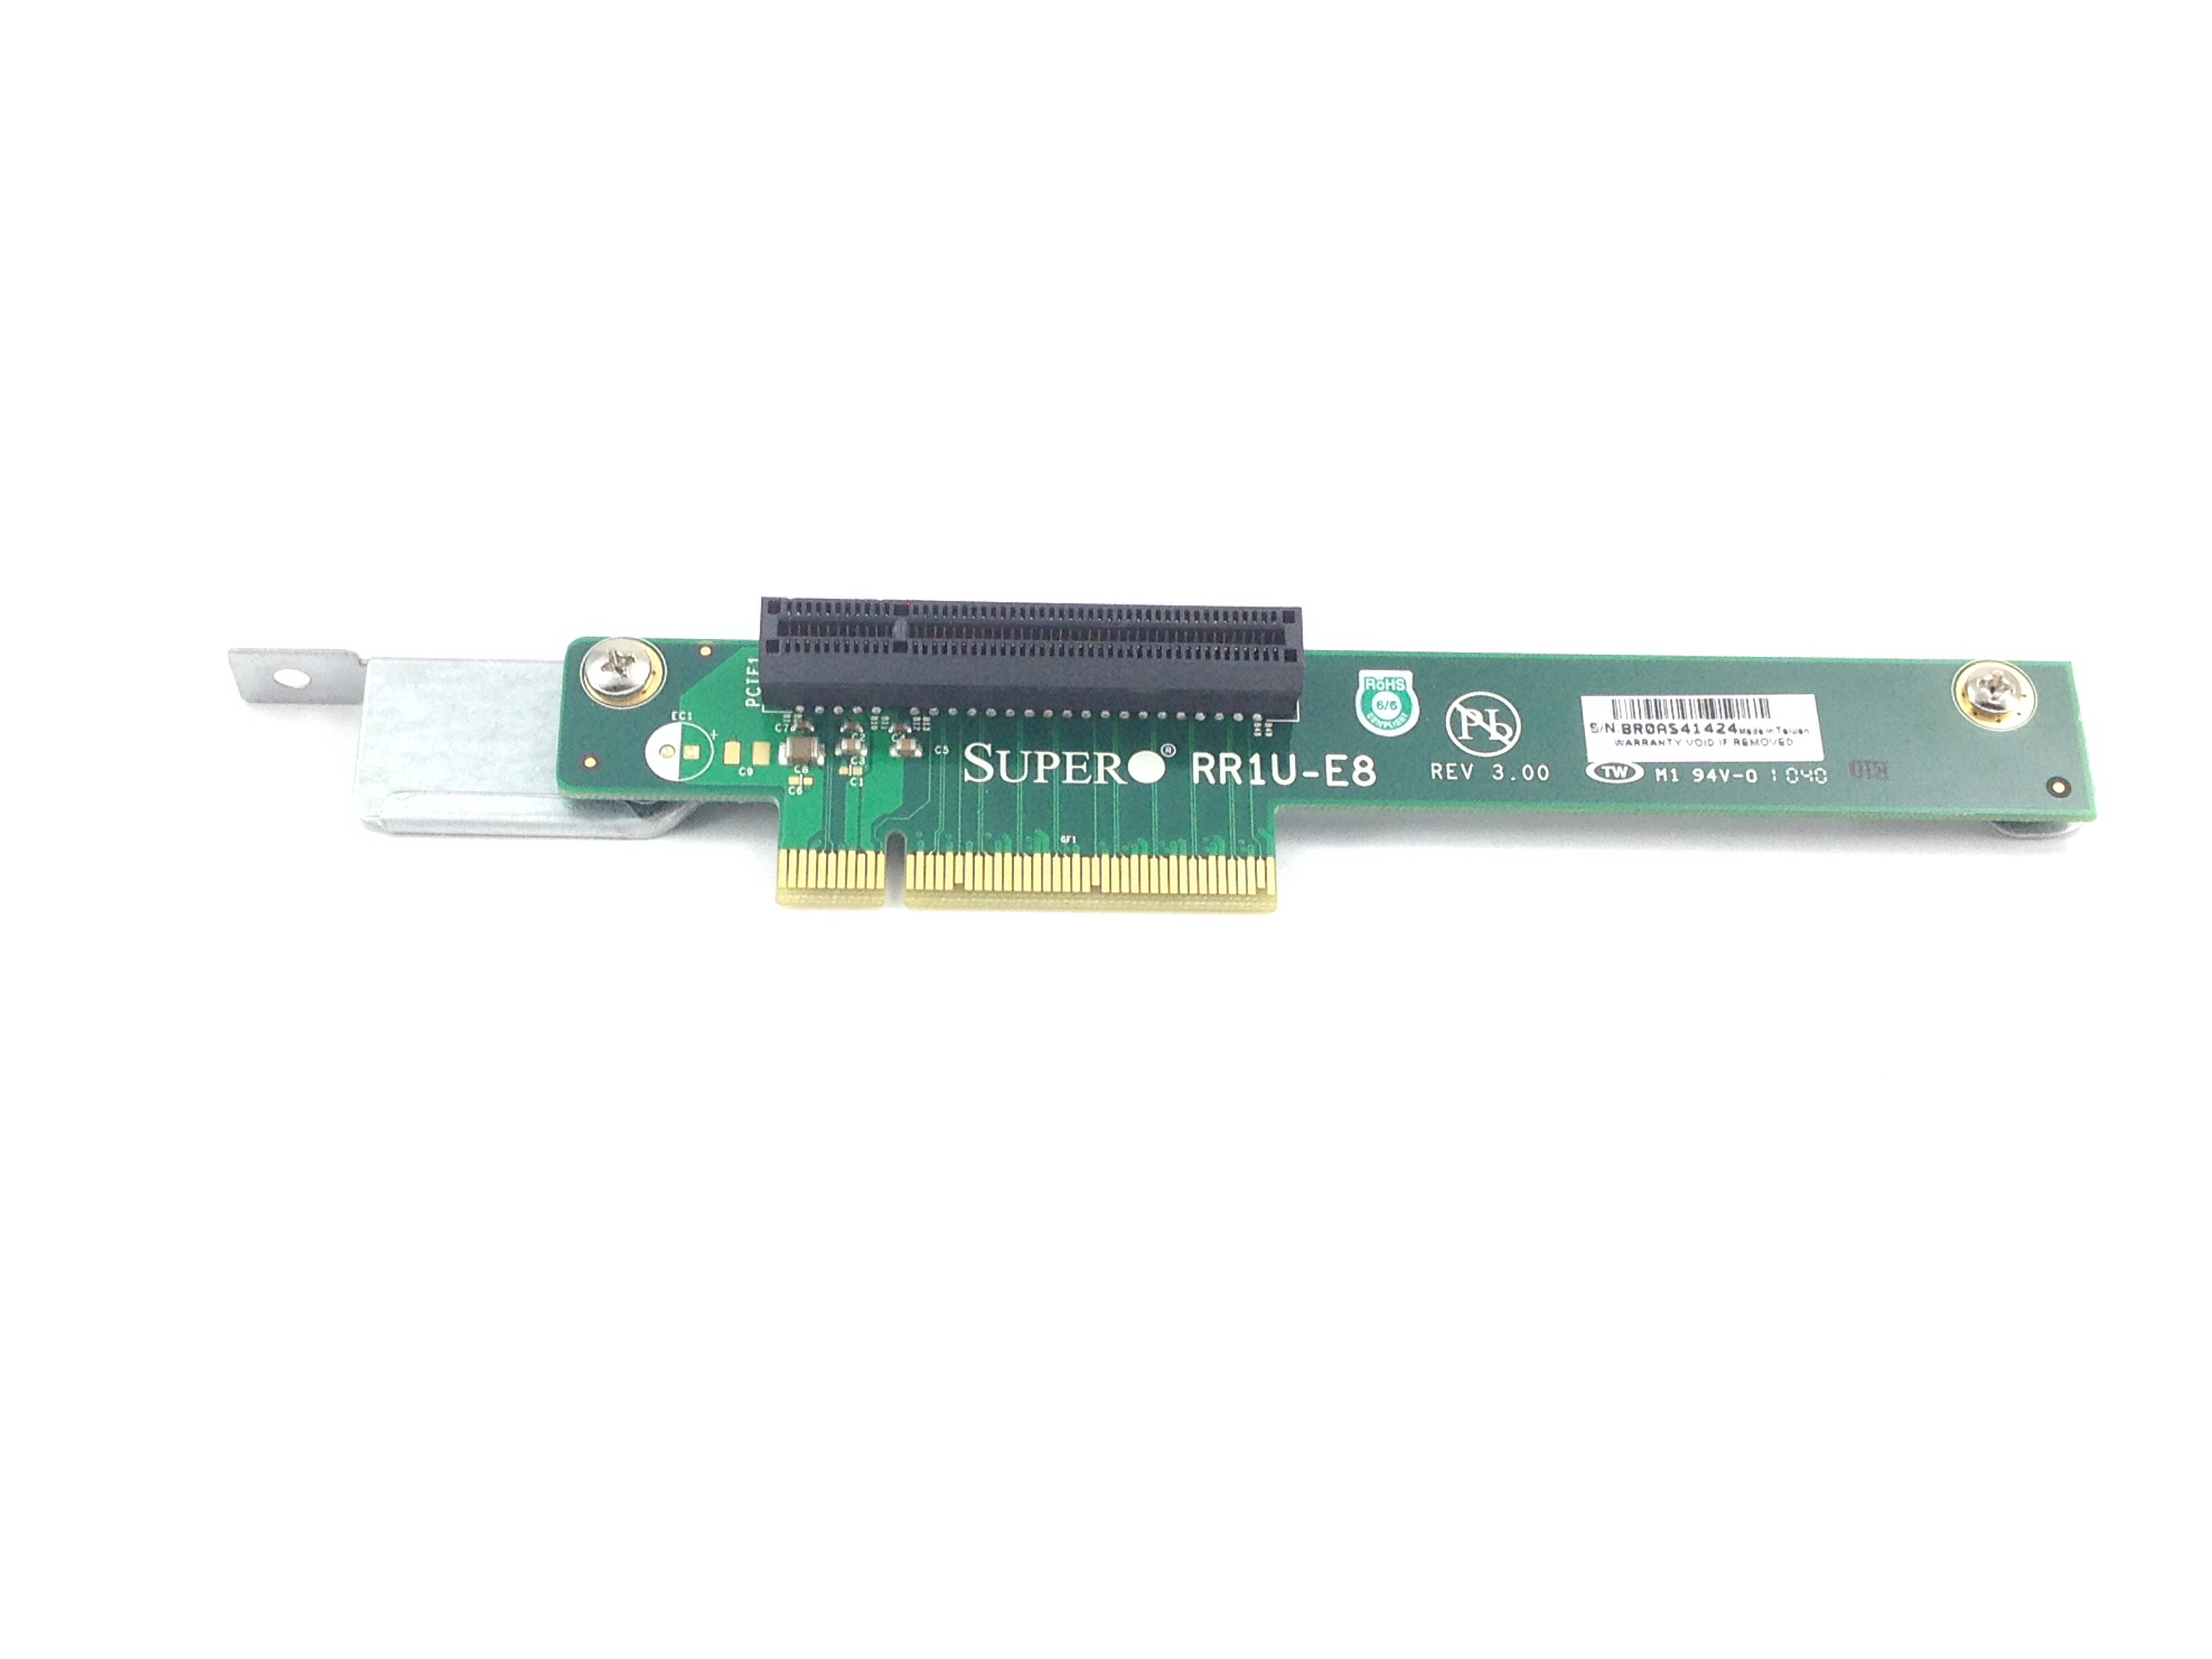 Supermicro 1U PCI-E X8 Server Riser Card Rev 3.00 (RR1U-E8)